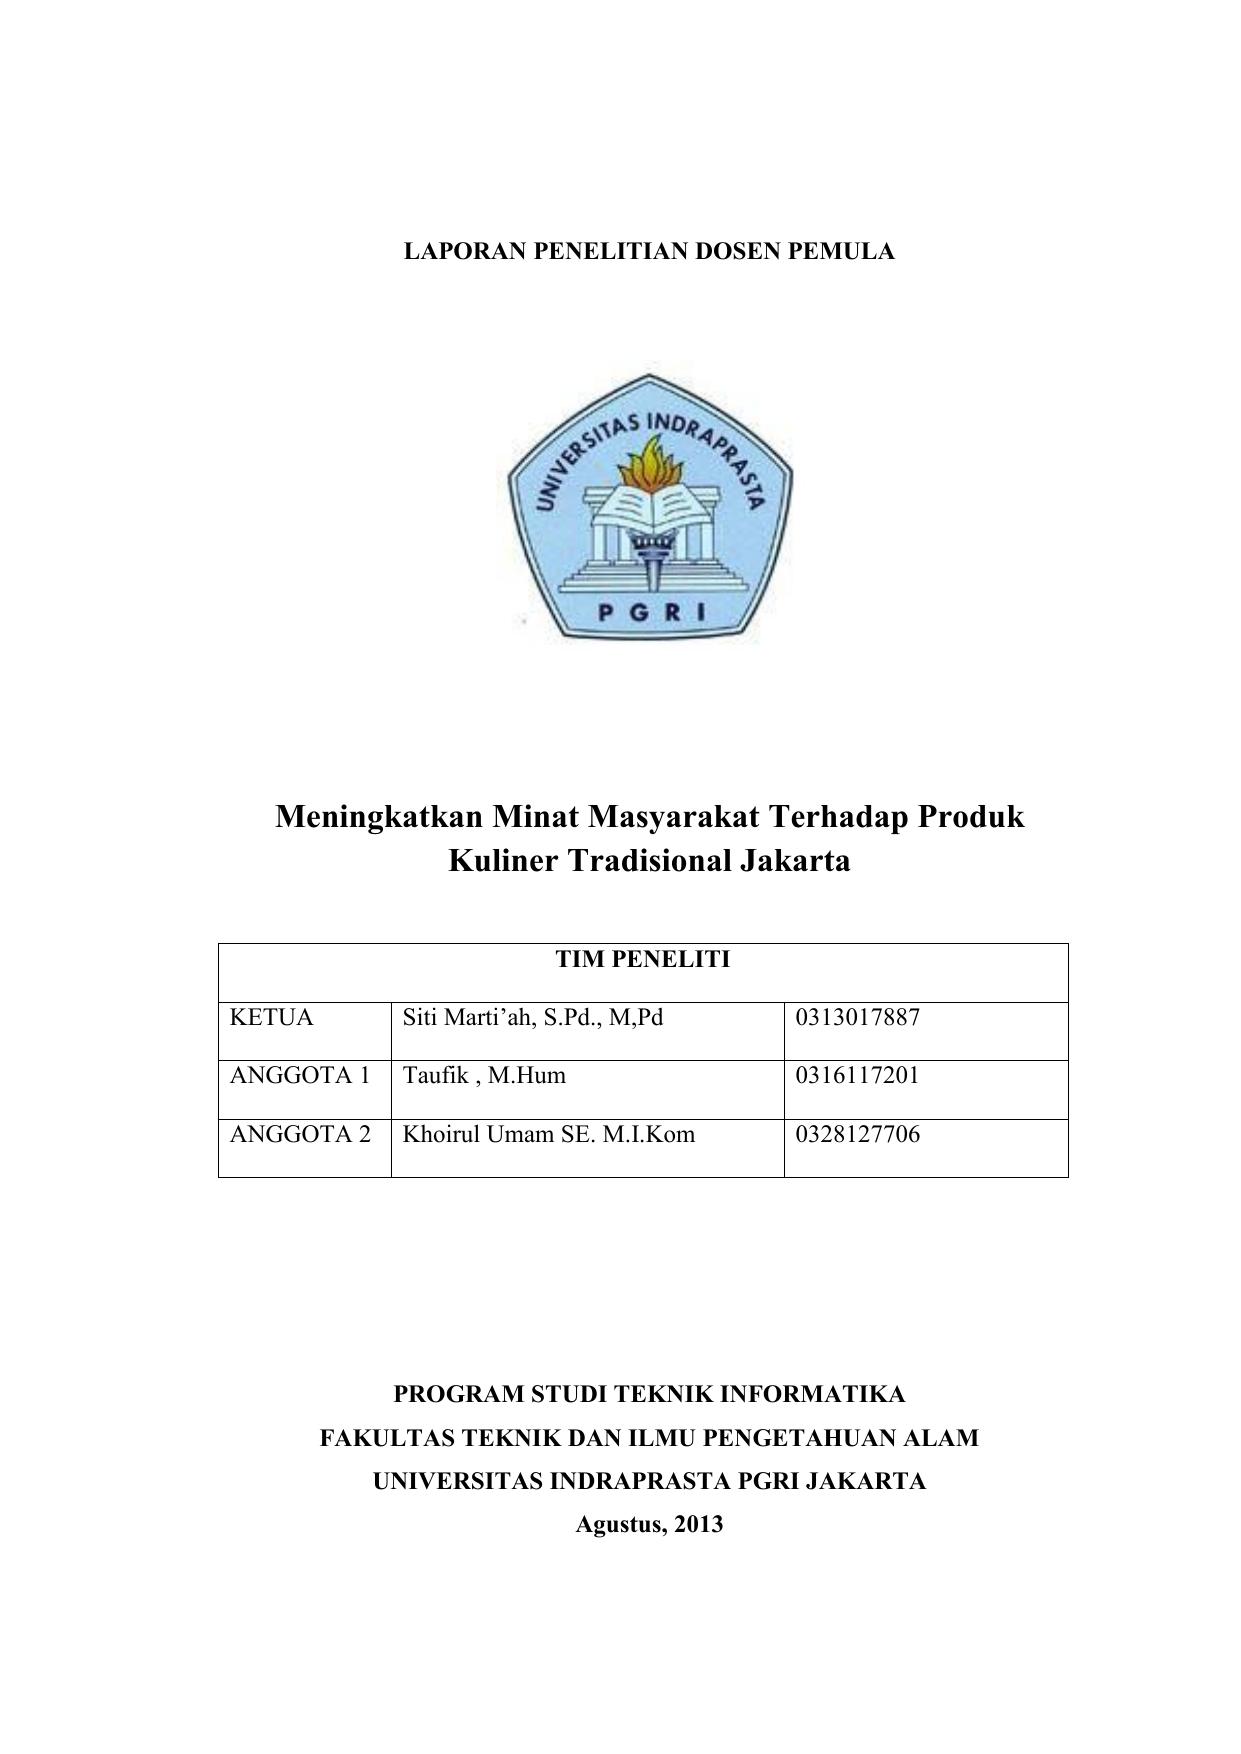 Contoh Bab 4 Skripsi Teknik Informatika Unindra - Kumpulan ...